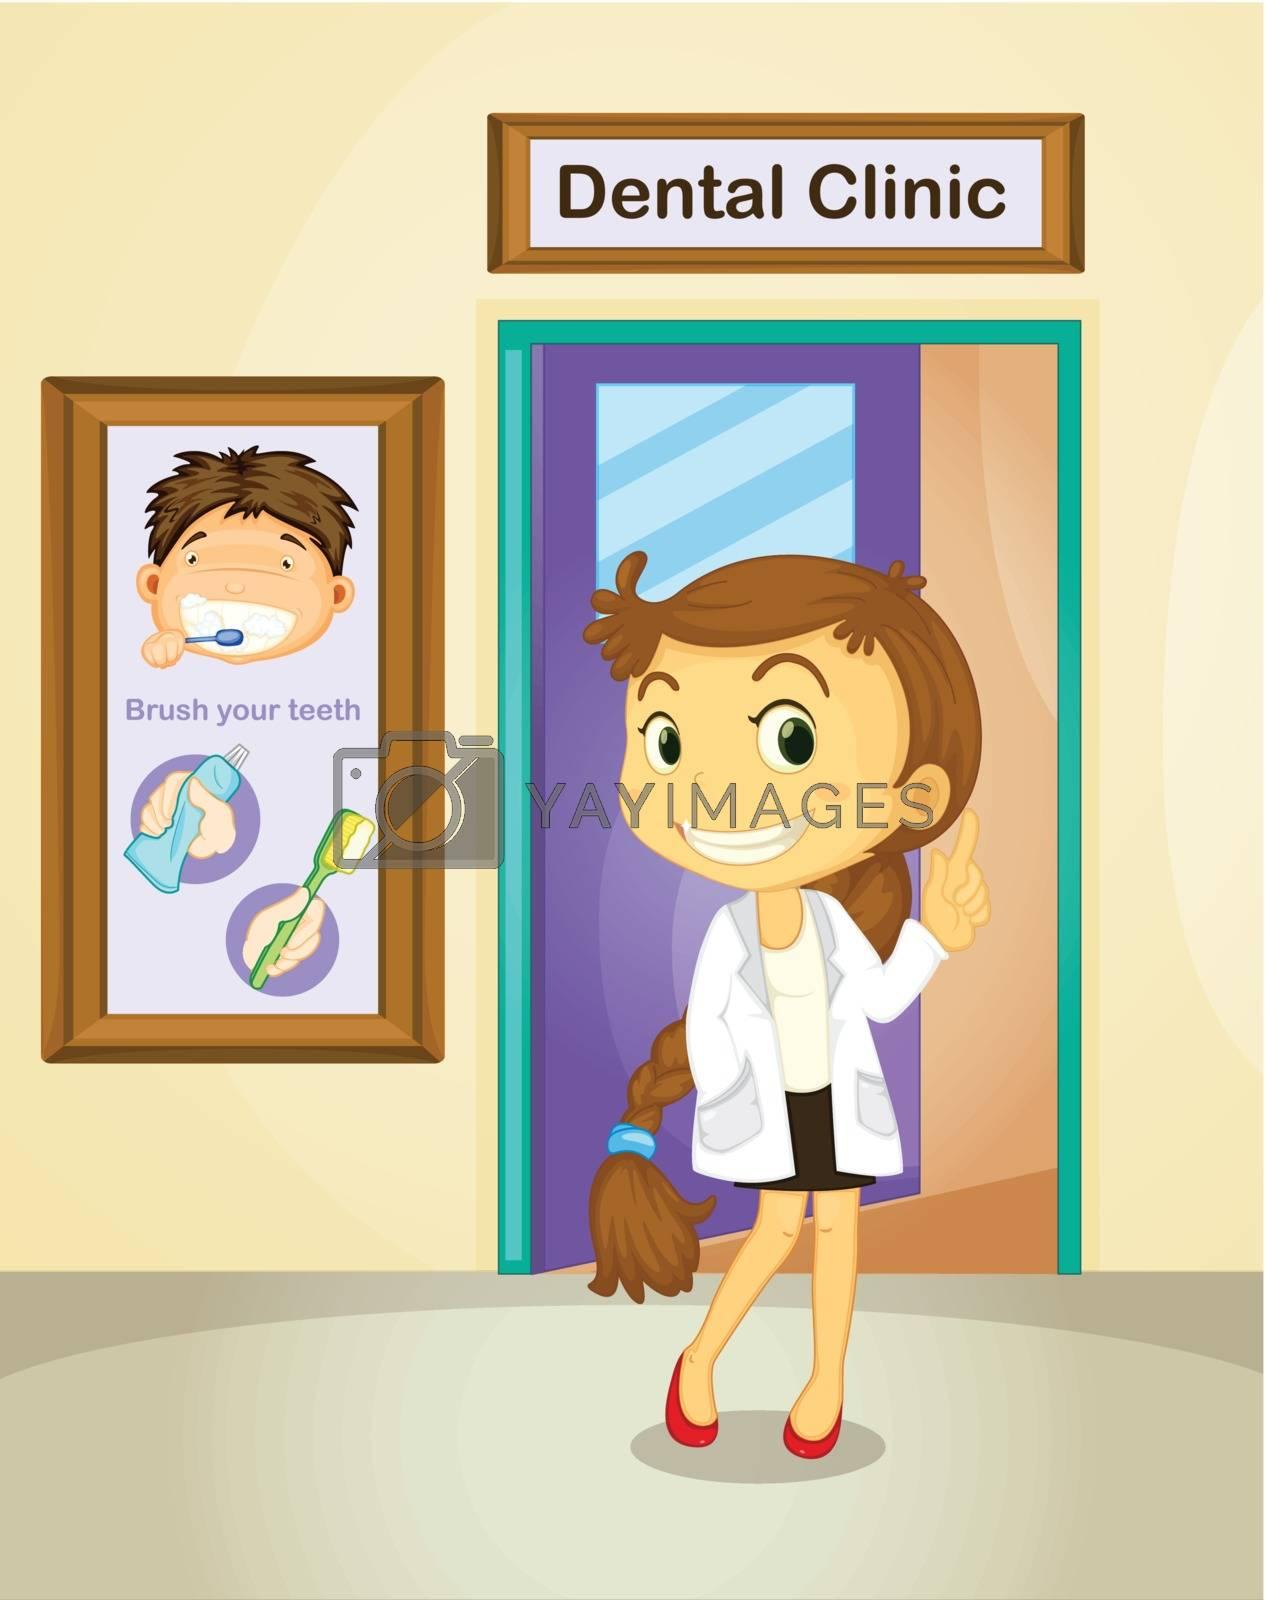 Illustration of a female dentist